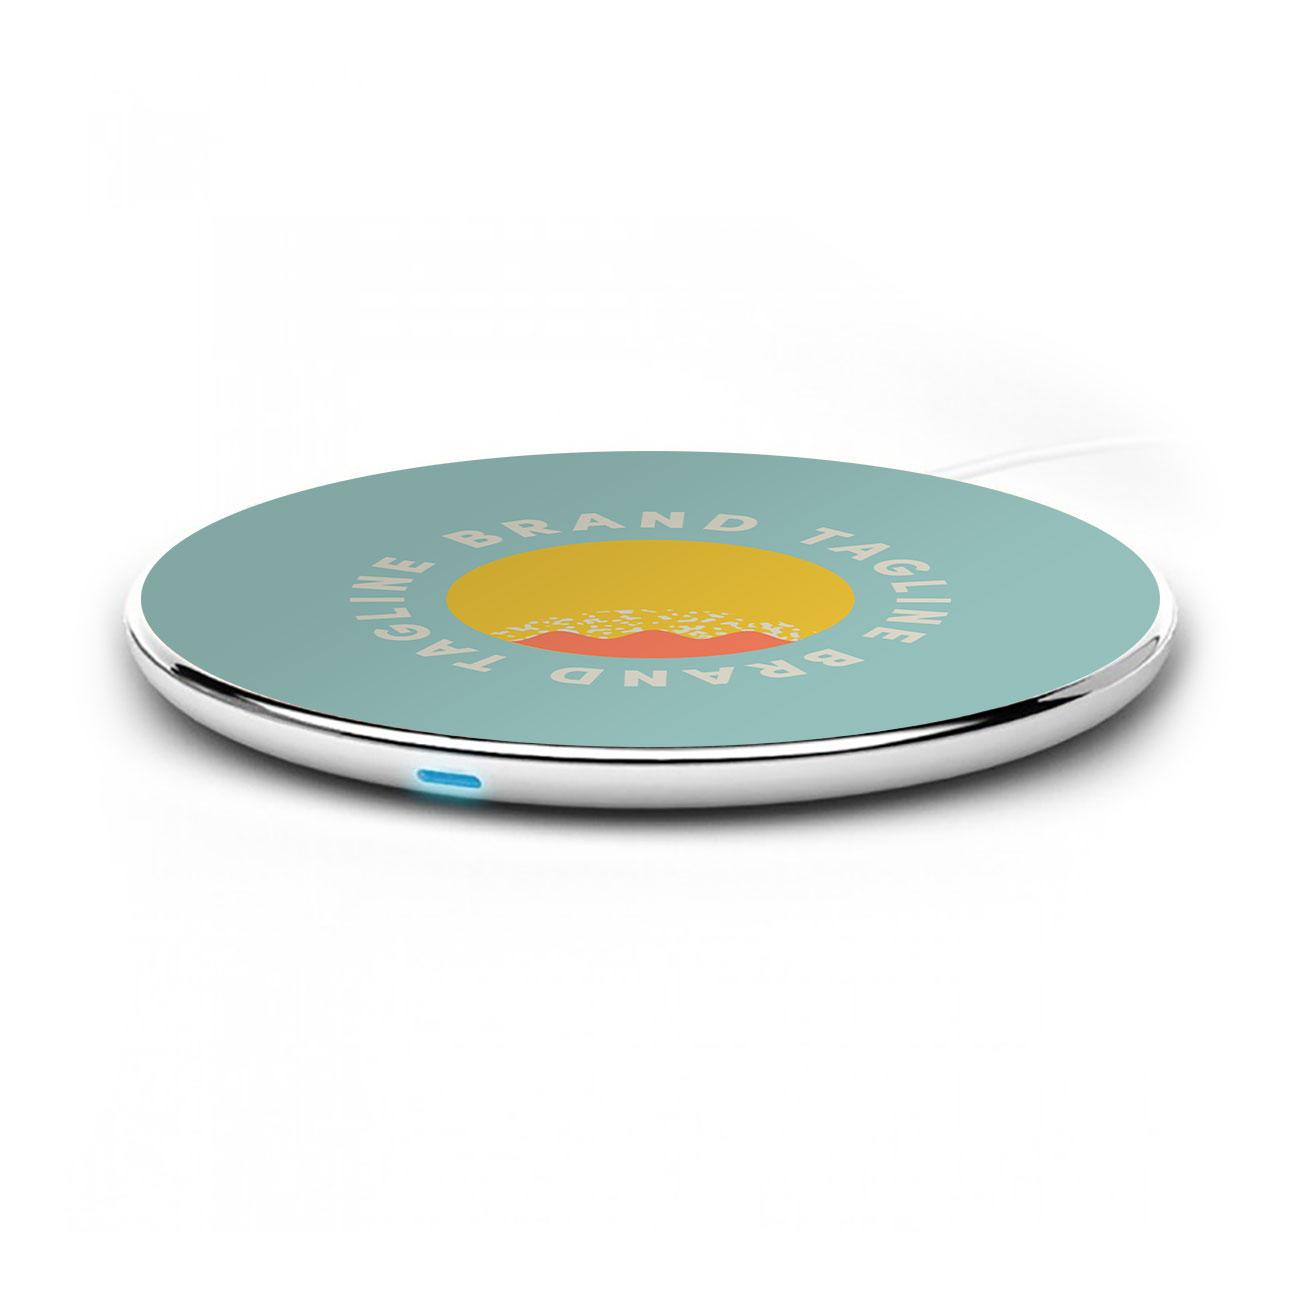 313726 spectrum charging pad full color imprint